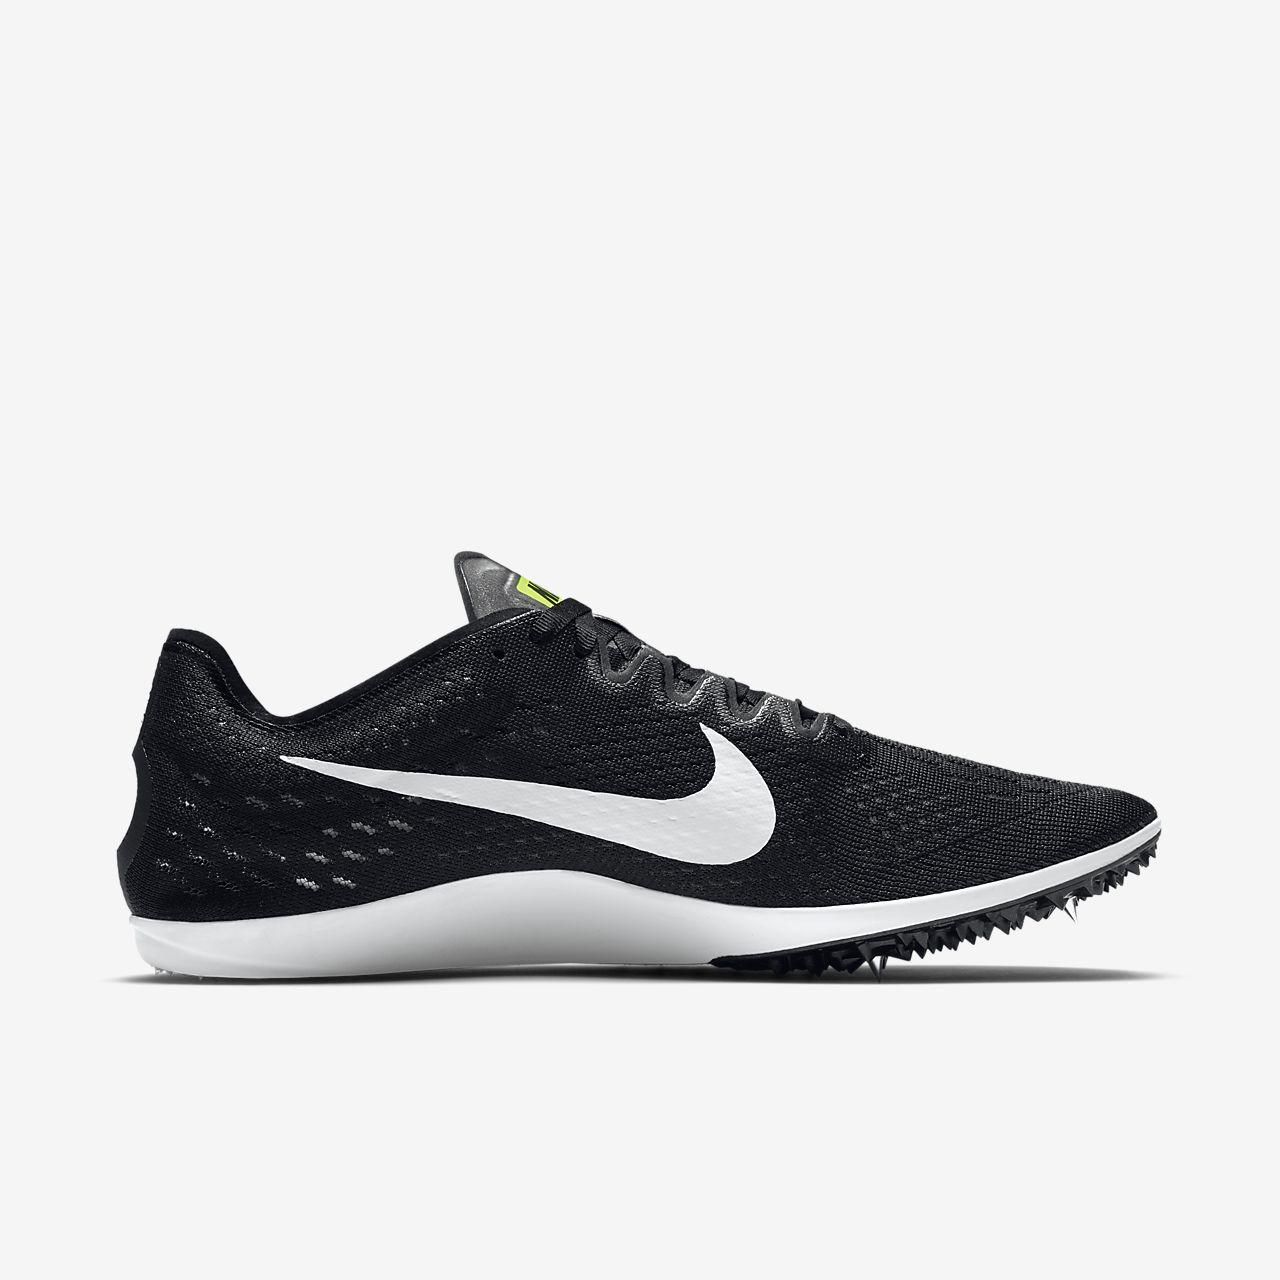 Nike Zoom D Women's Running Shoes Black/Violet/White uQ4902M